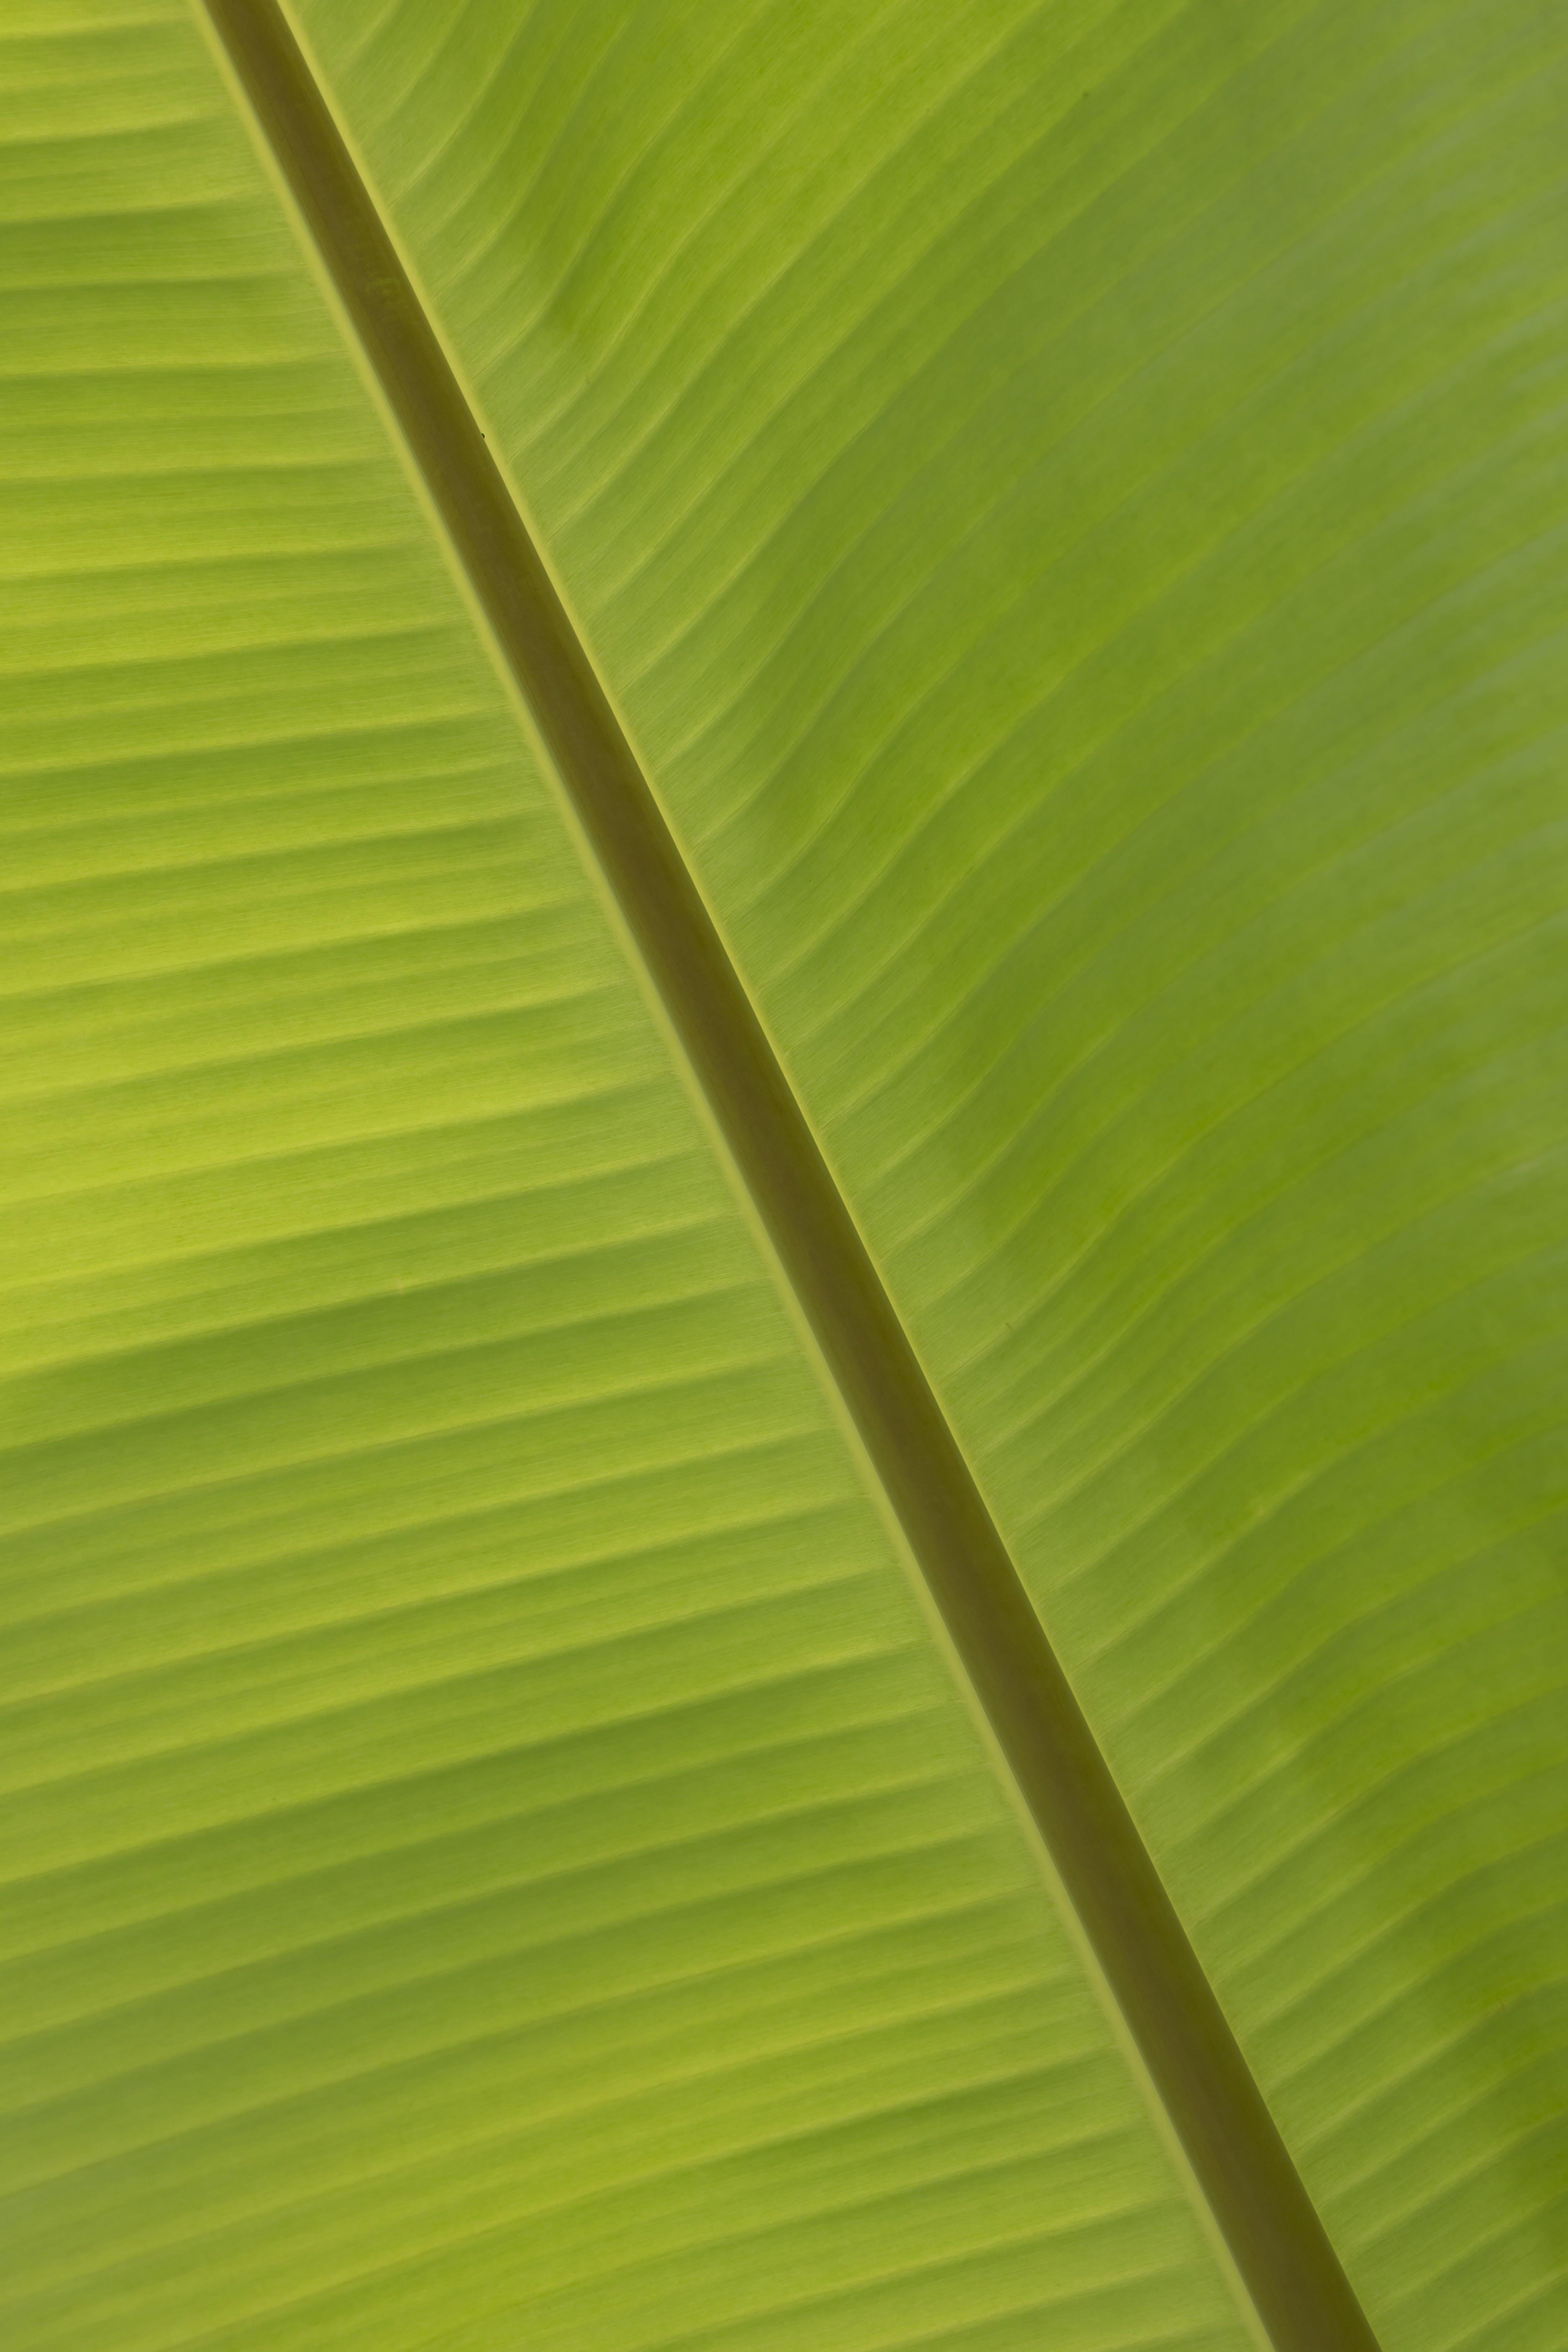 Free stock photo of abstract, banana, banana leaf, bright